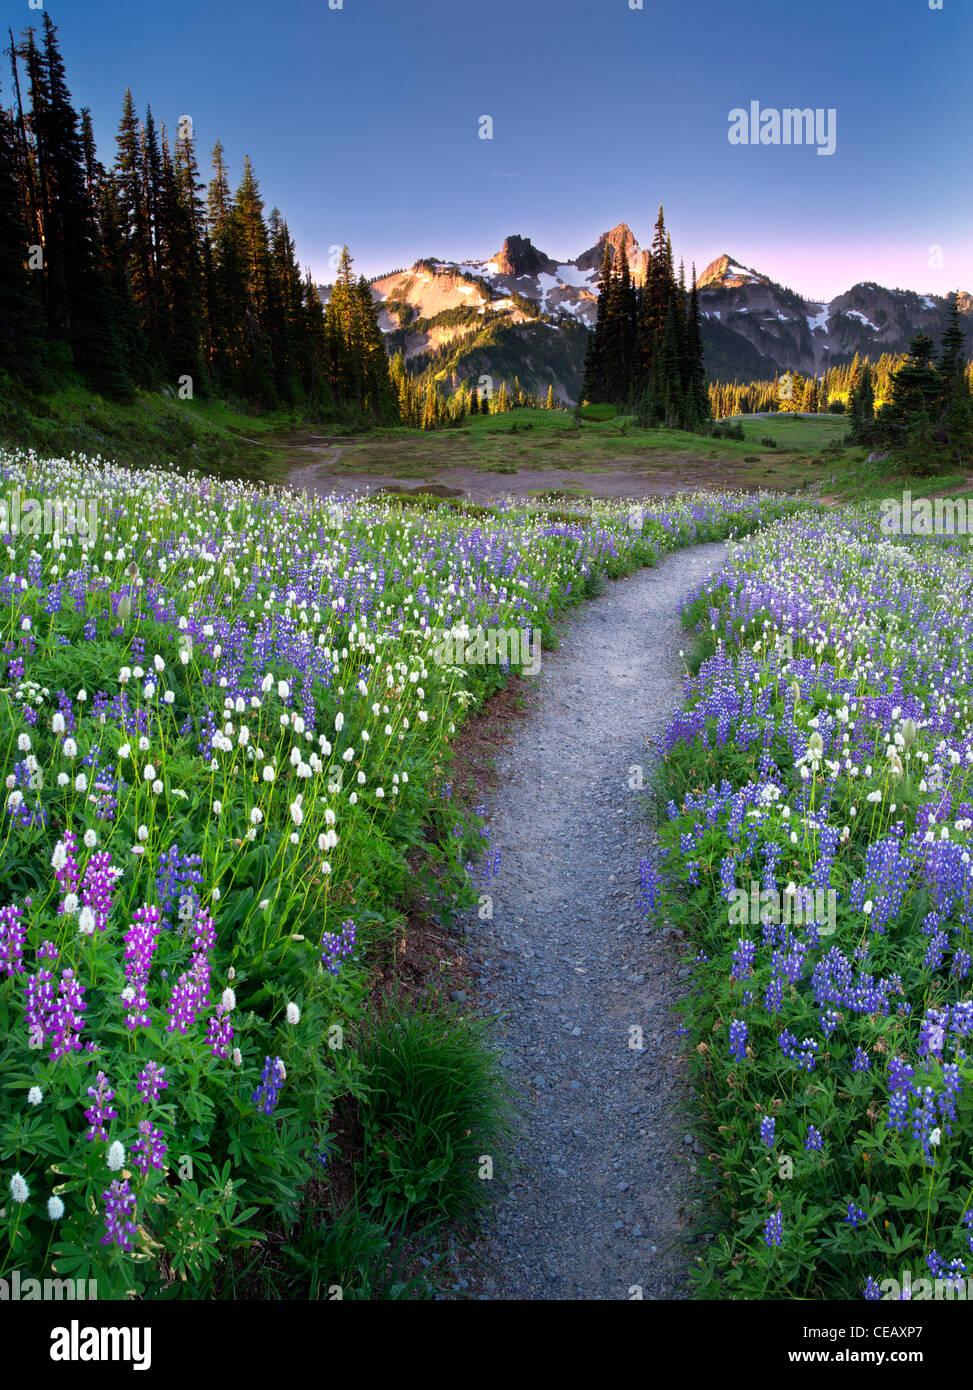 Tatoosh Berge, Wildblumen und Weg. Mt Rainier Nationalpark, Washington Stockbild